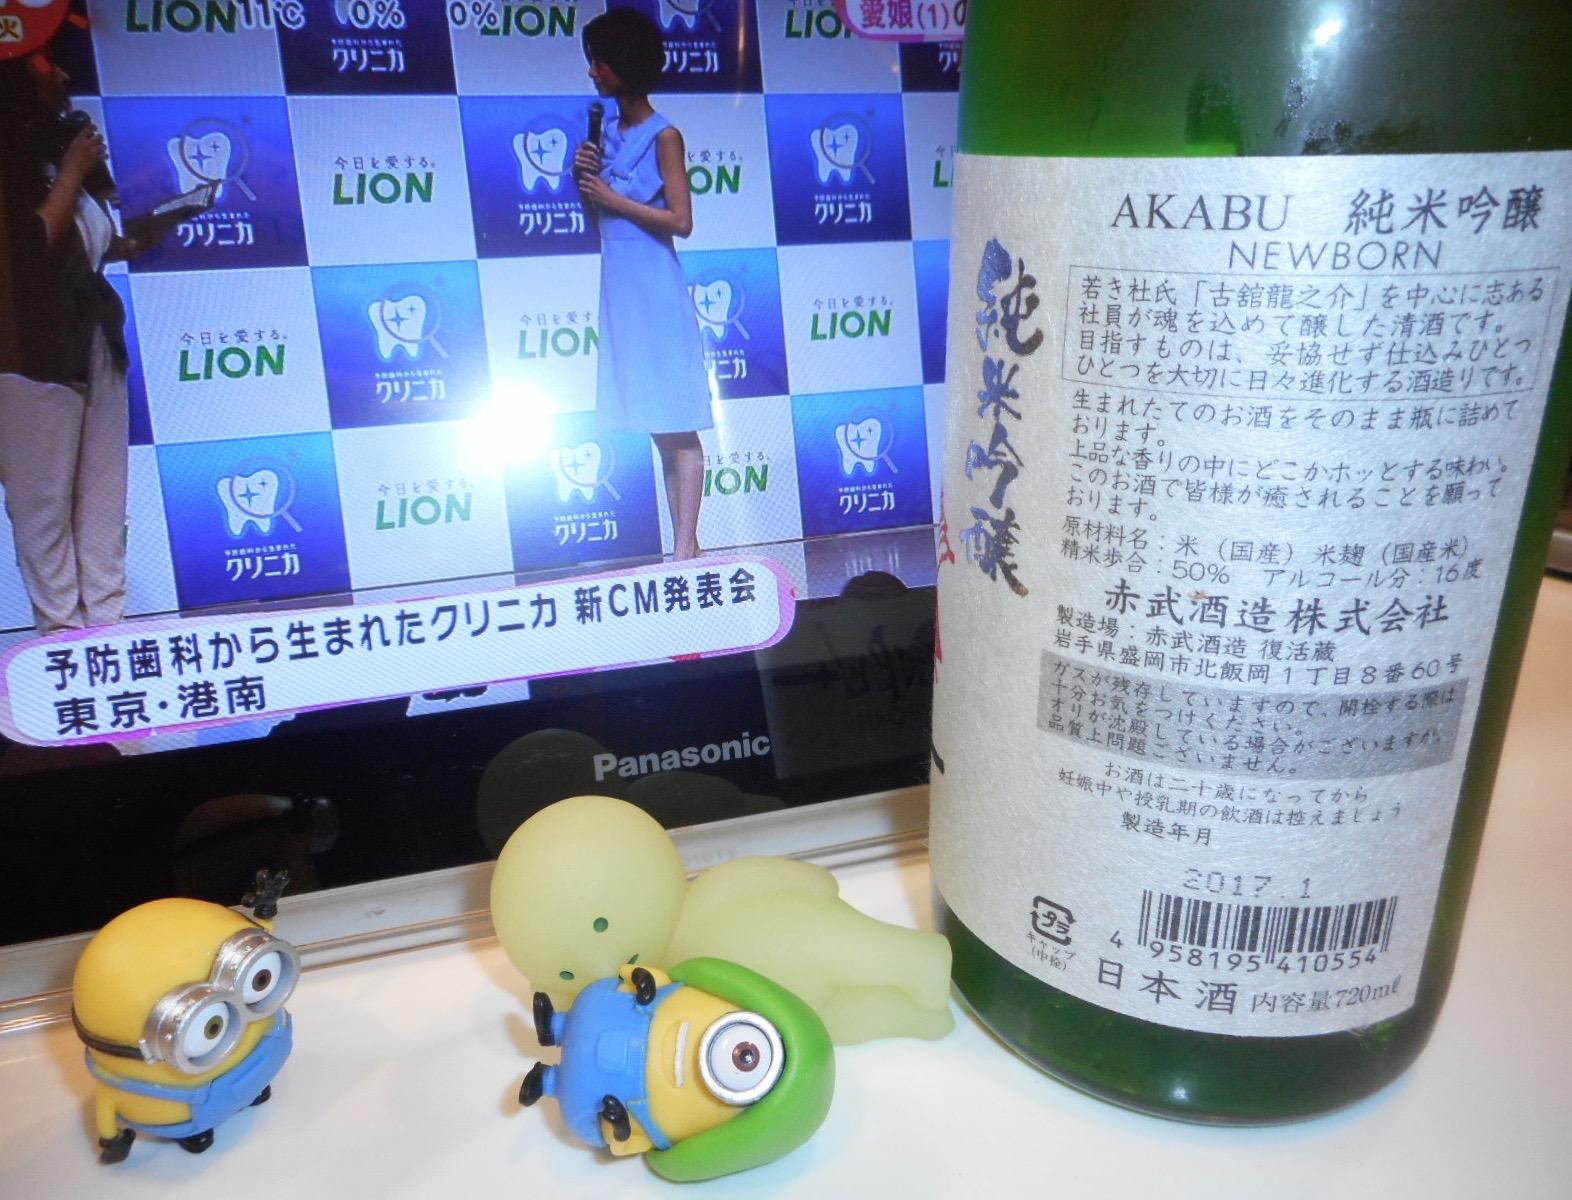 akabu_newborn_jungin28by2.jpg